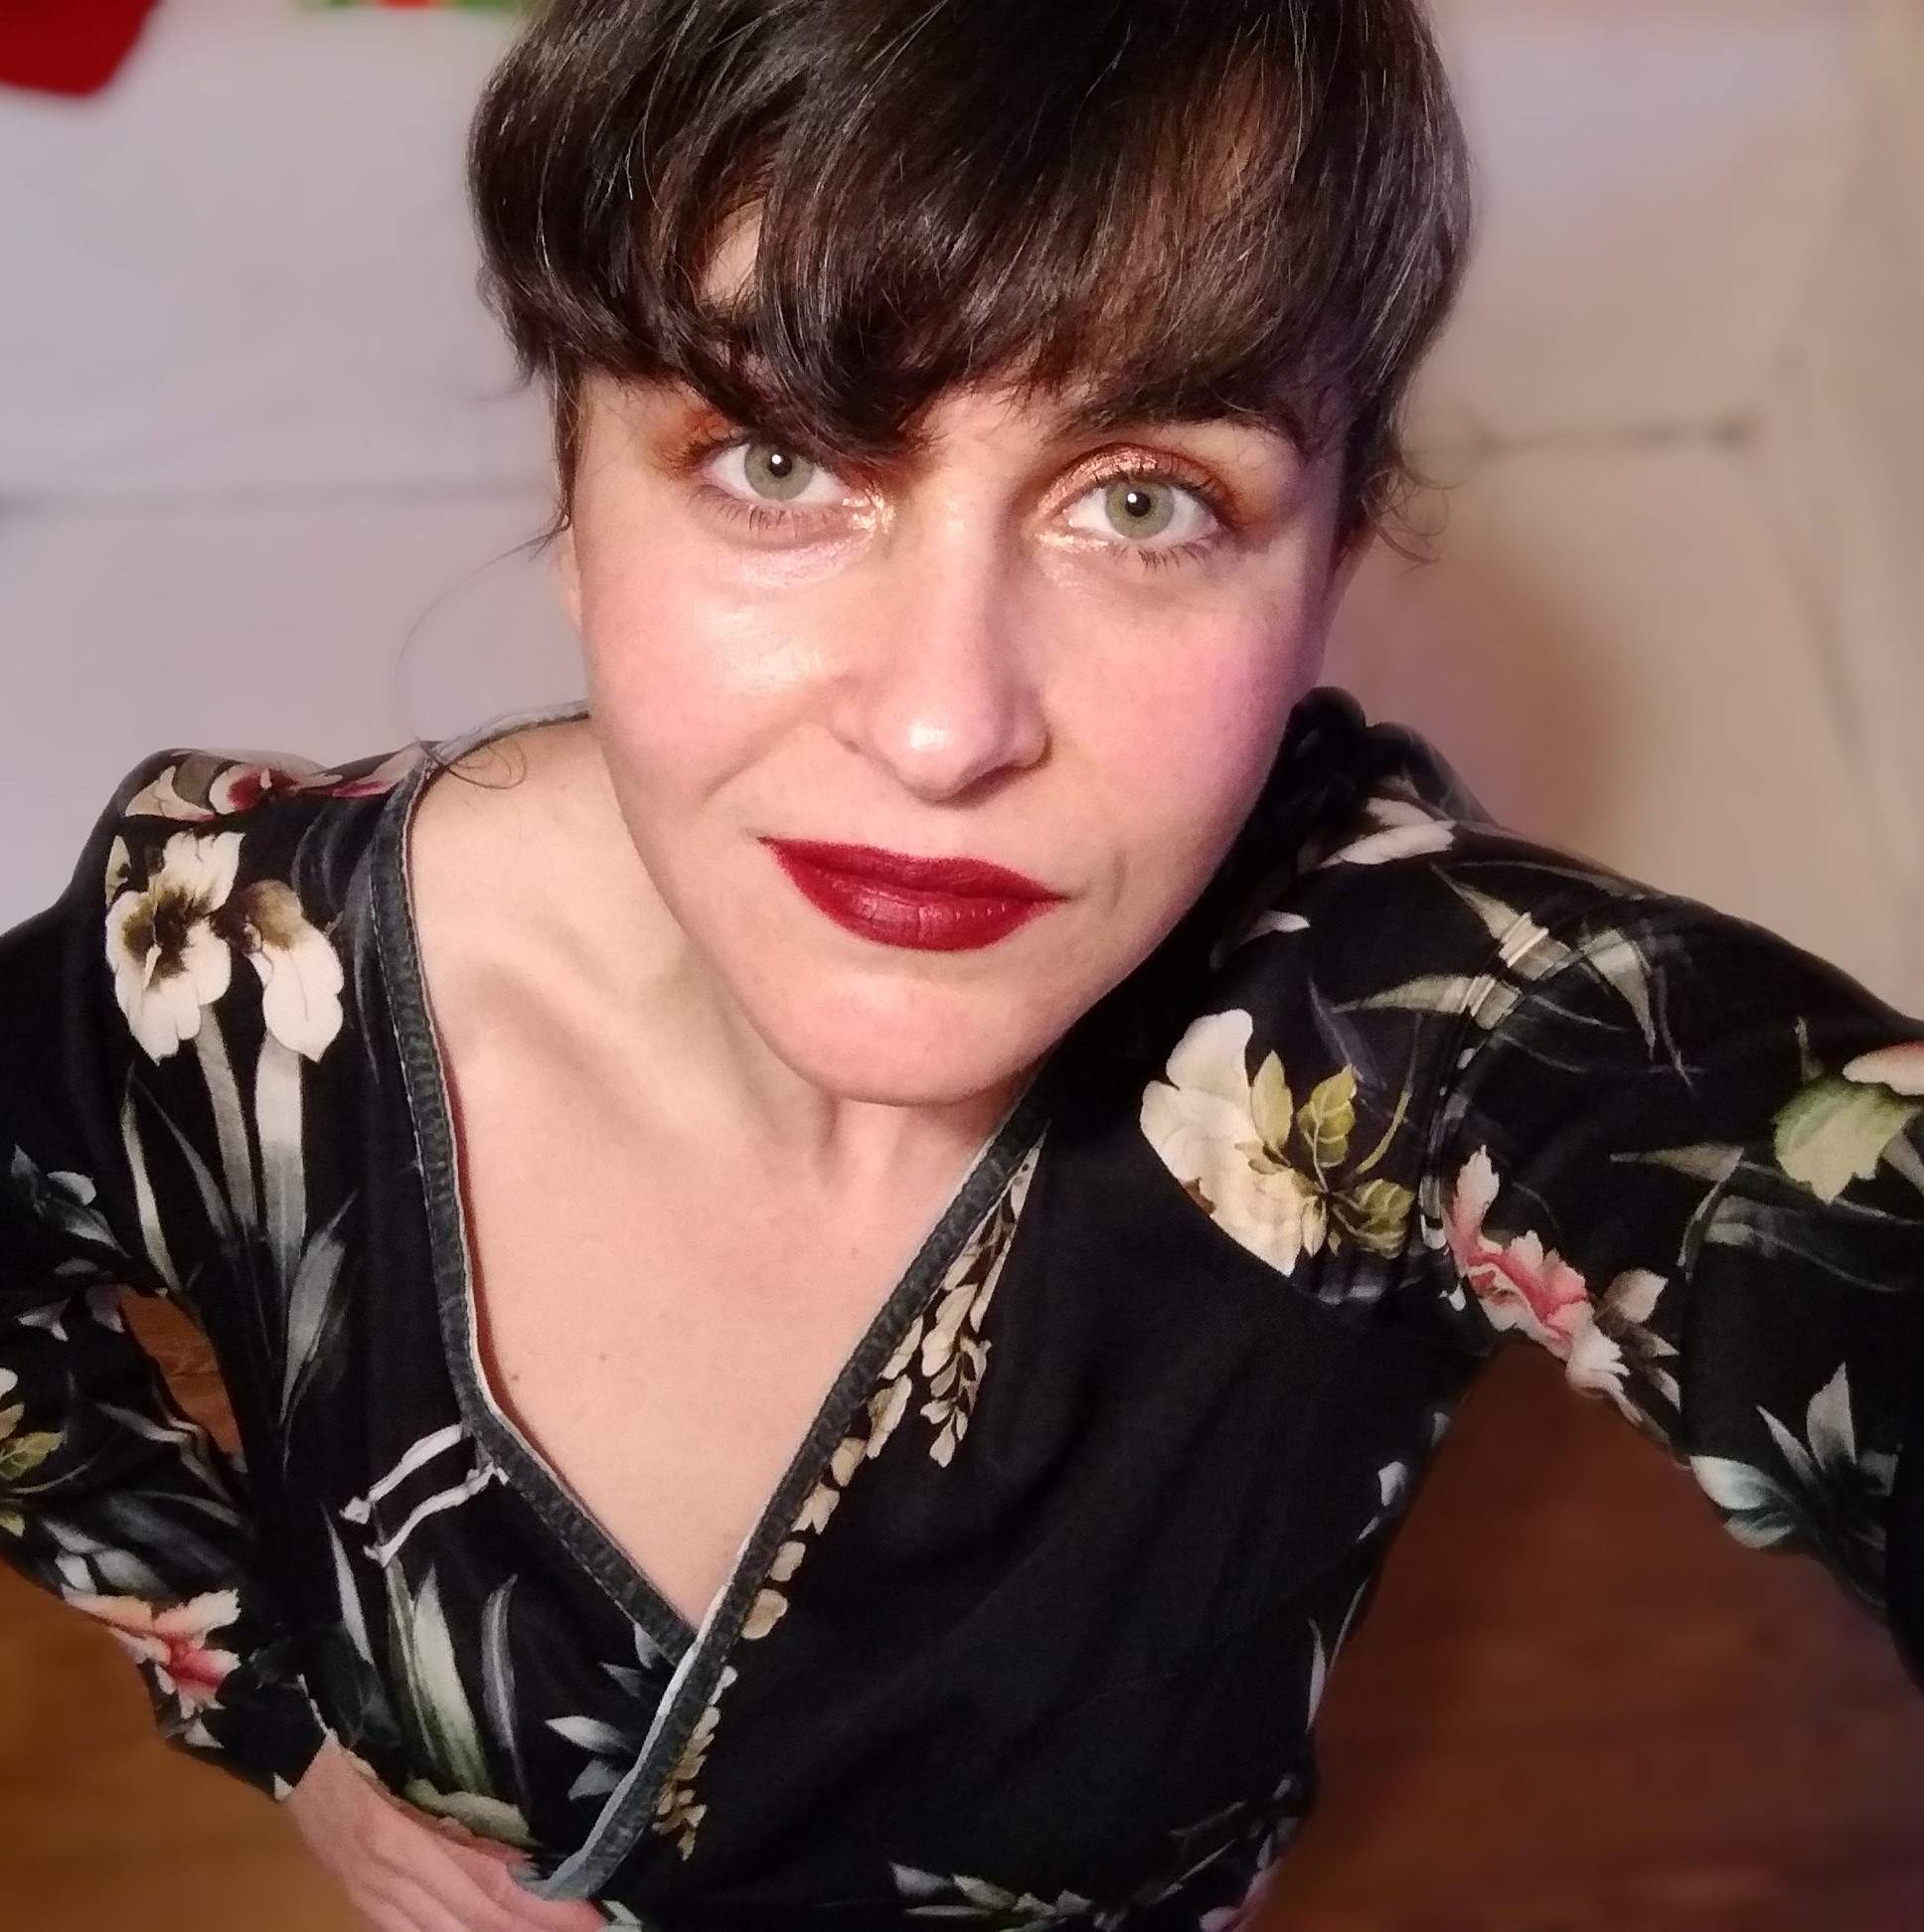 Diana Sieira